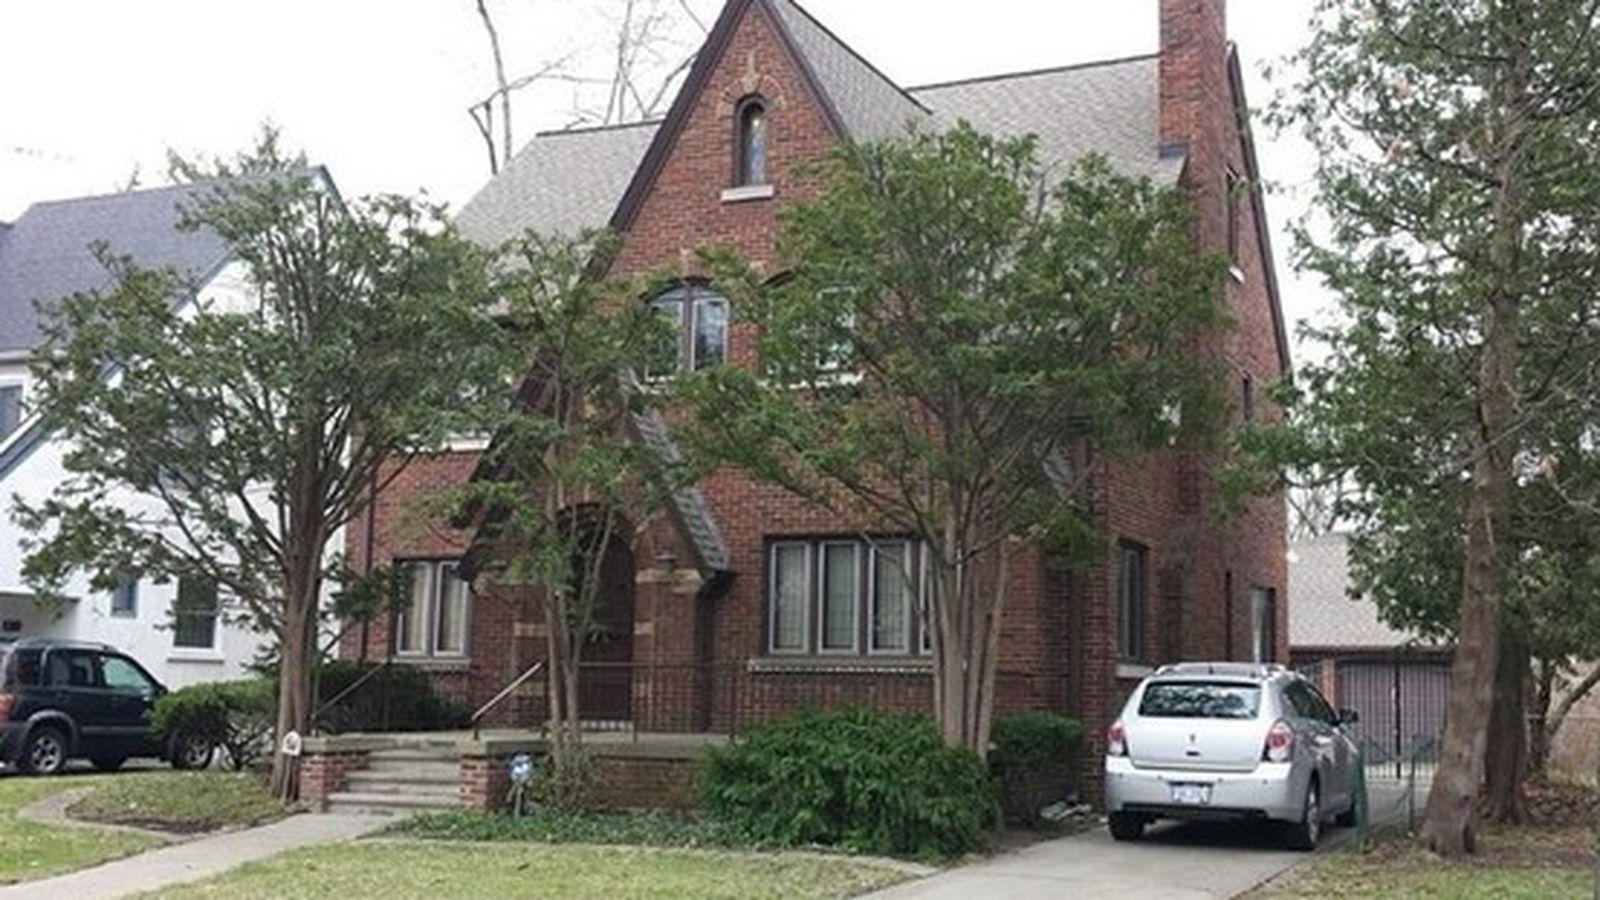 university district home with vintage details asks 289k